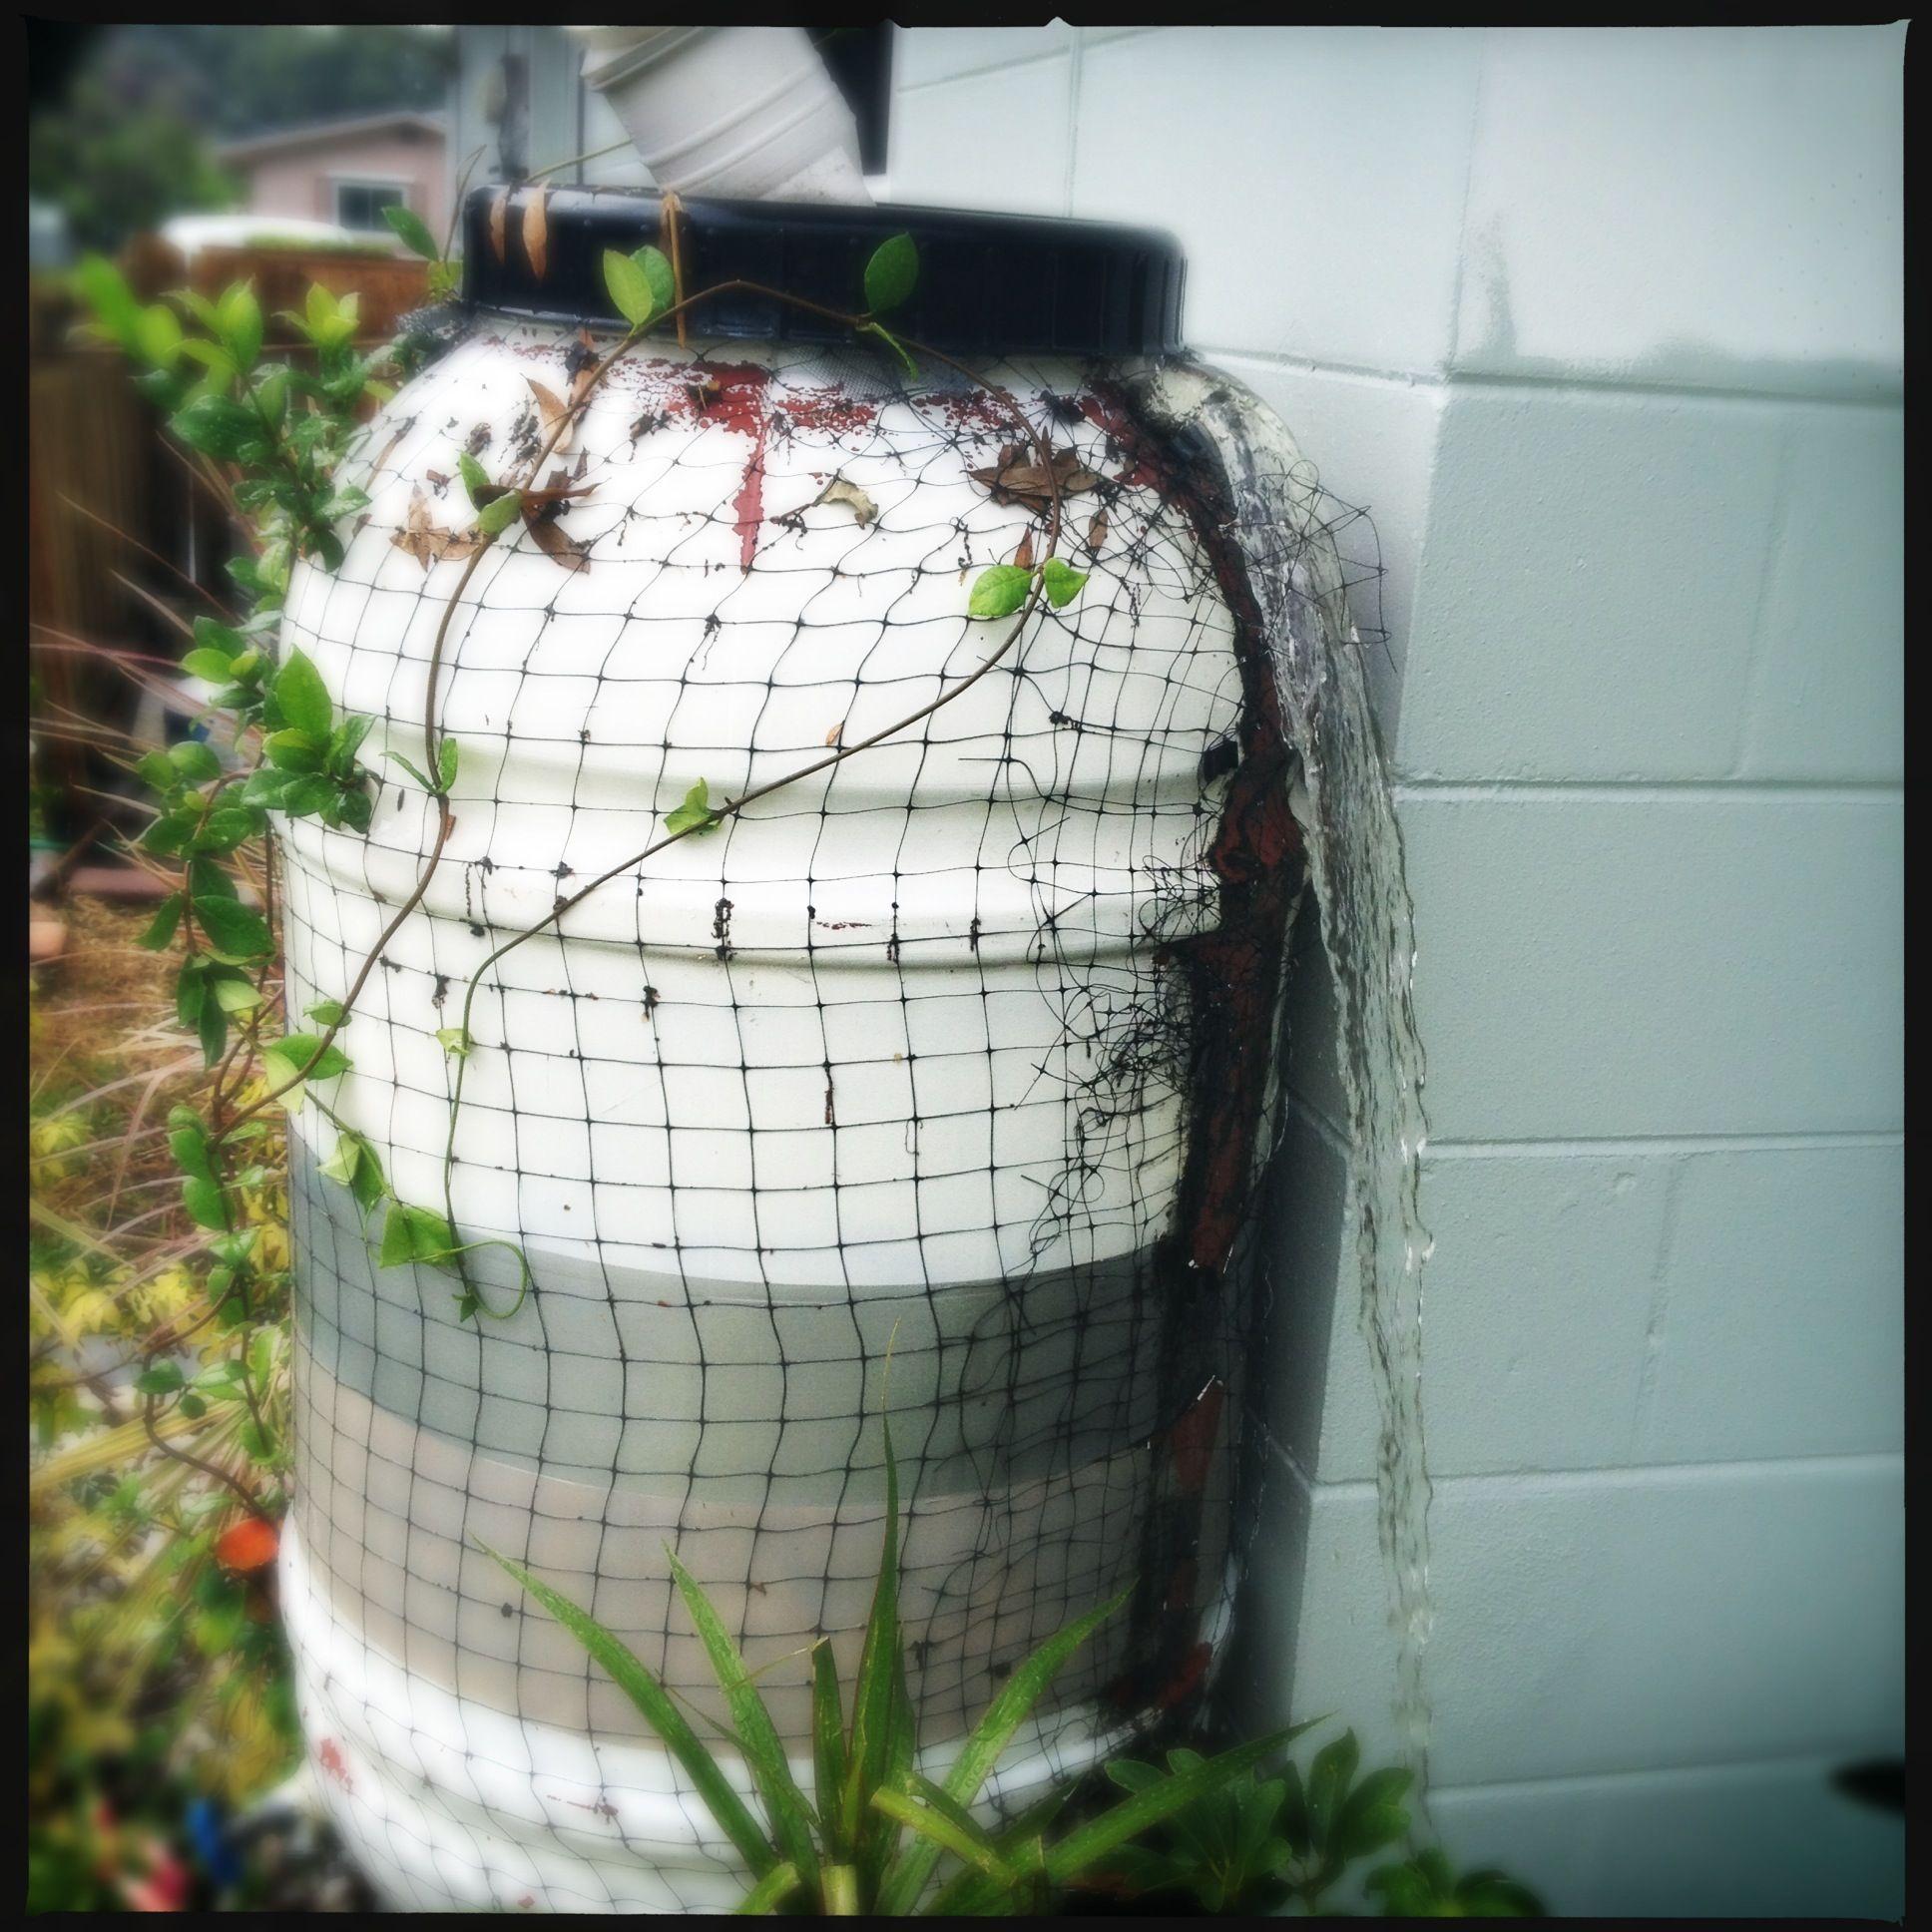 Rain barrel with netting and jasmine vine